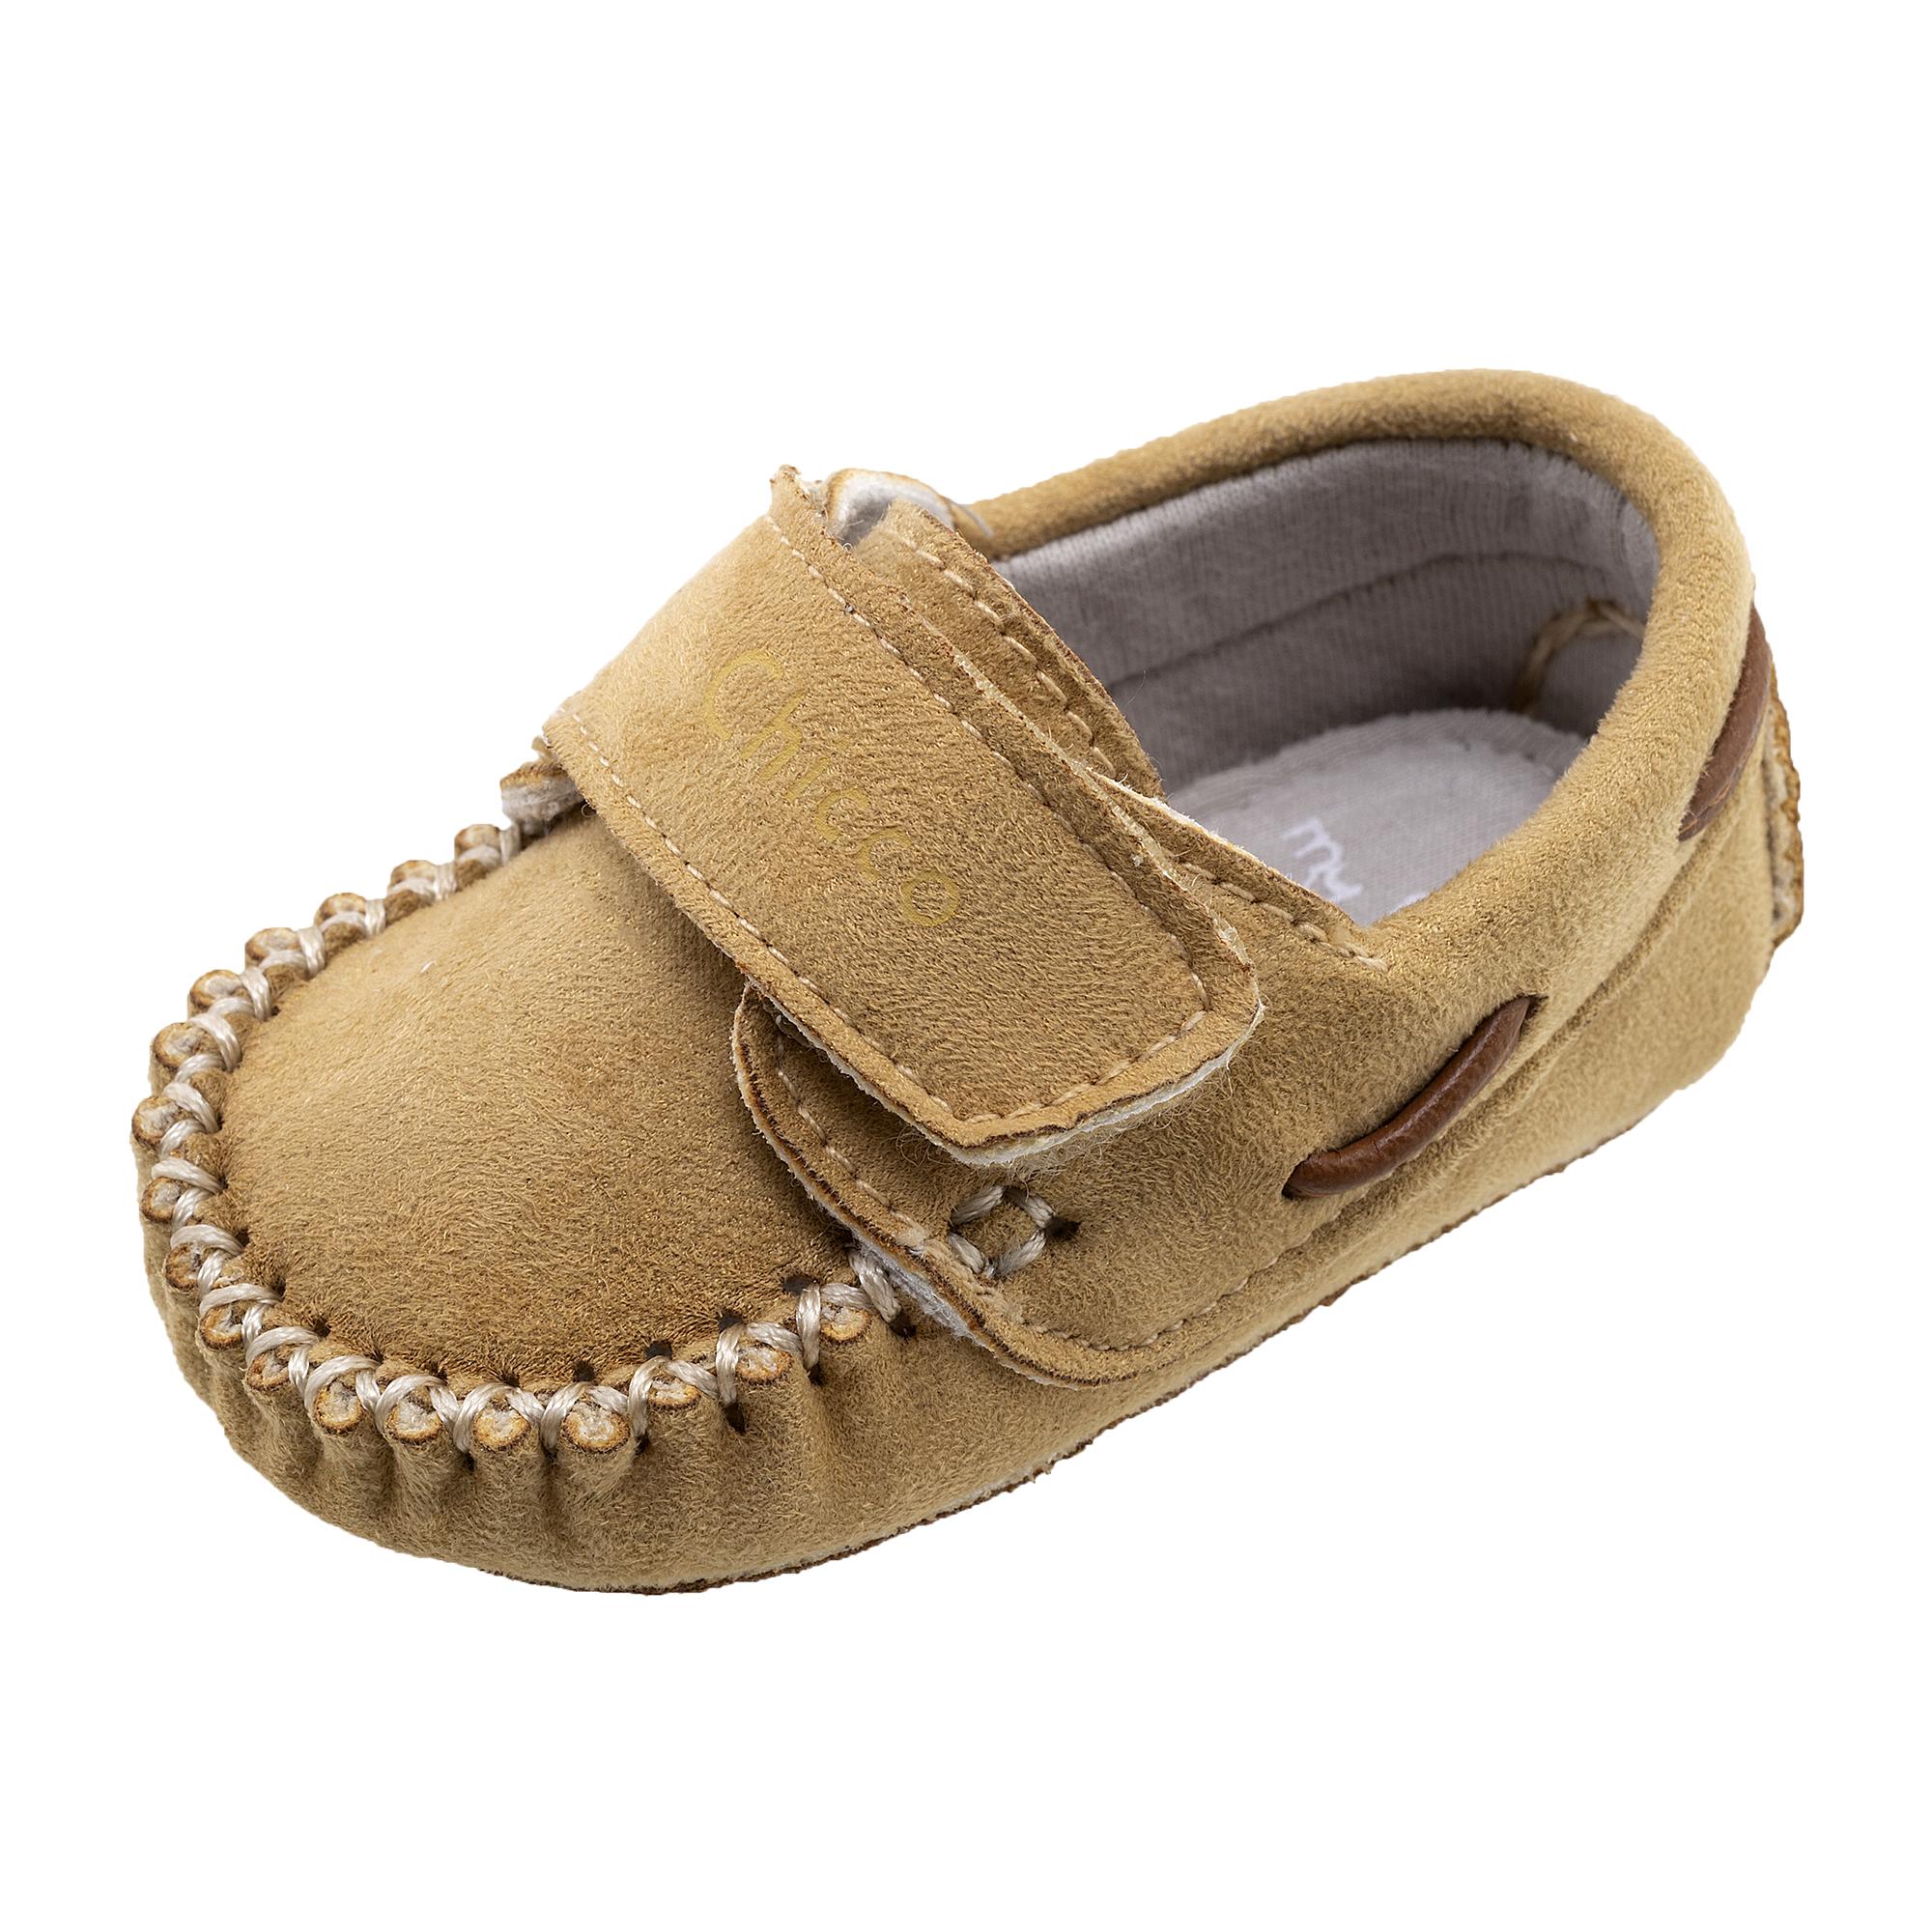 Pantofi Copii Chicco Olivio, Cu Snur, Bej, 62105 imagine